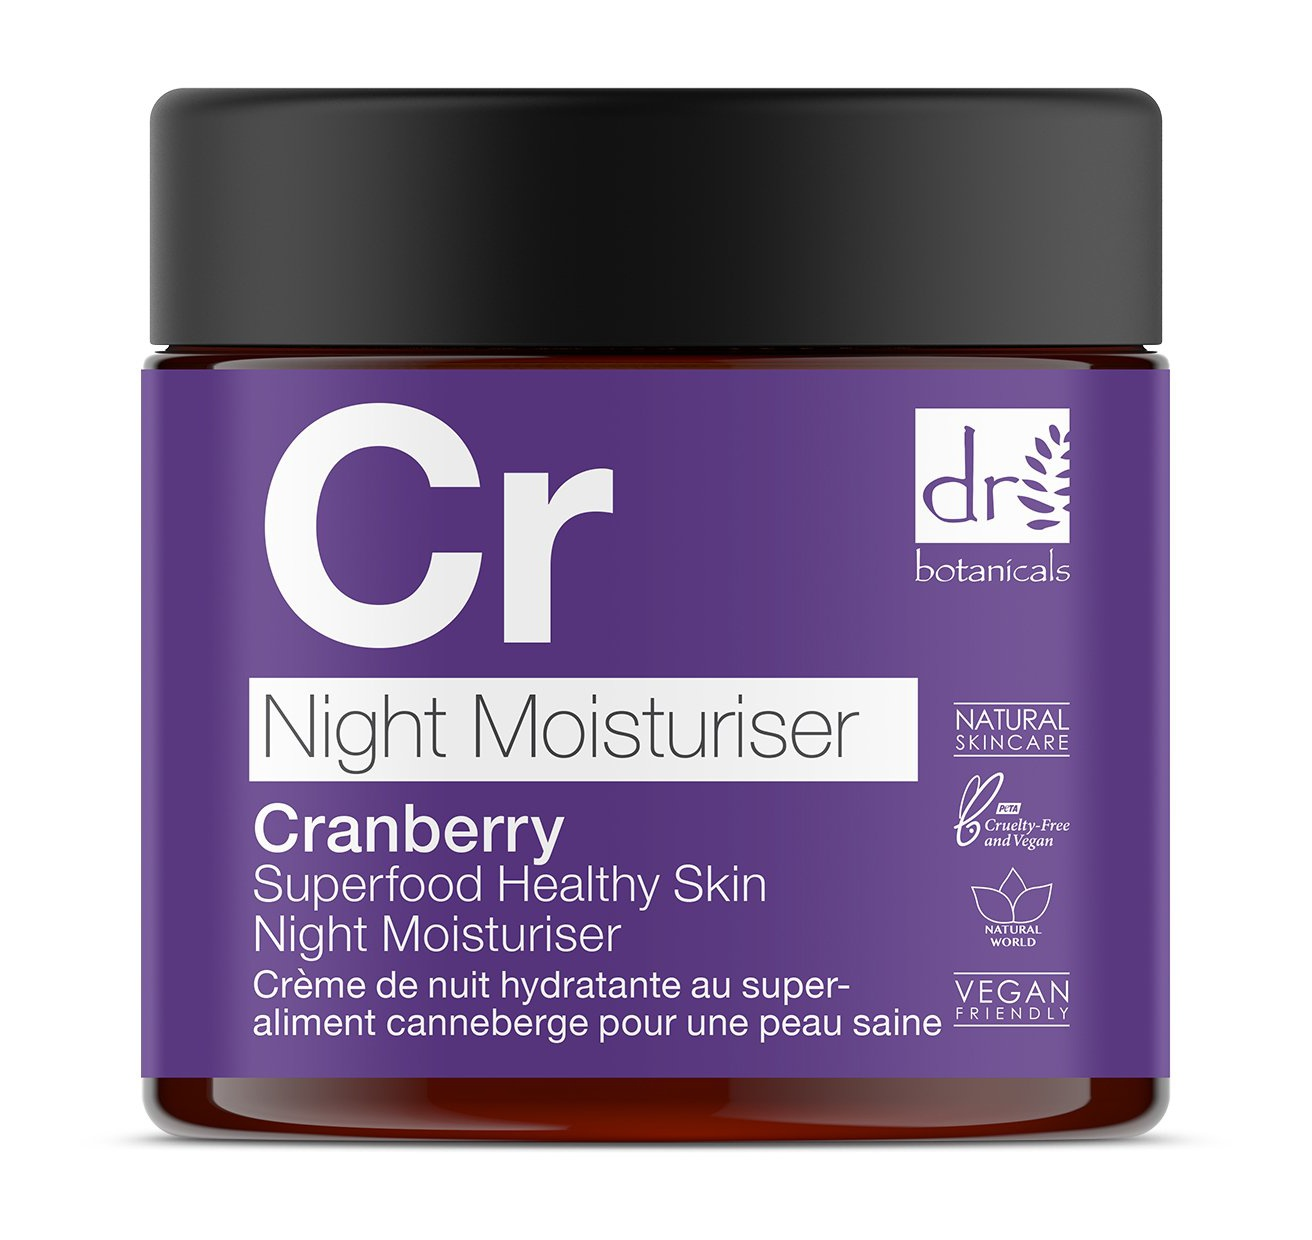 Dr Botanicals Cranberry Superfood Healthy Skin Night Moisturiser